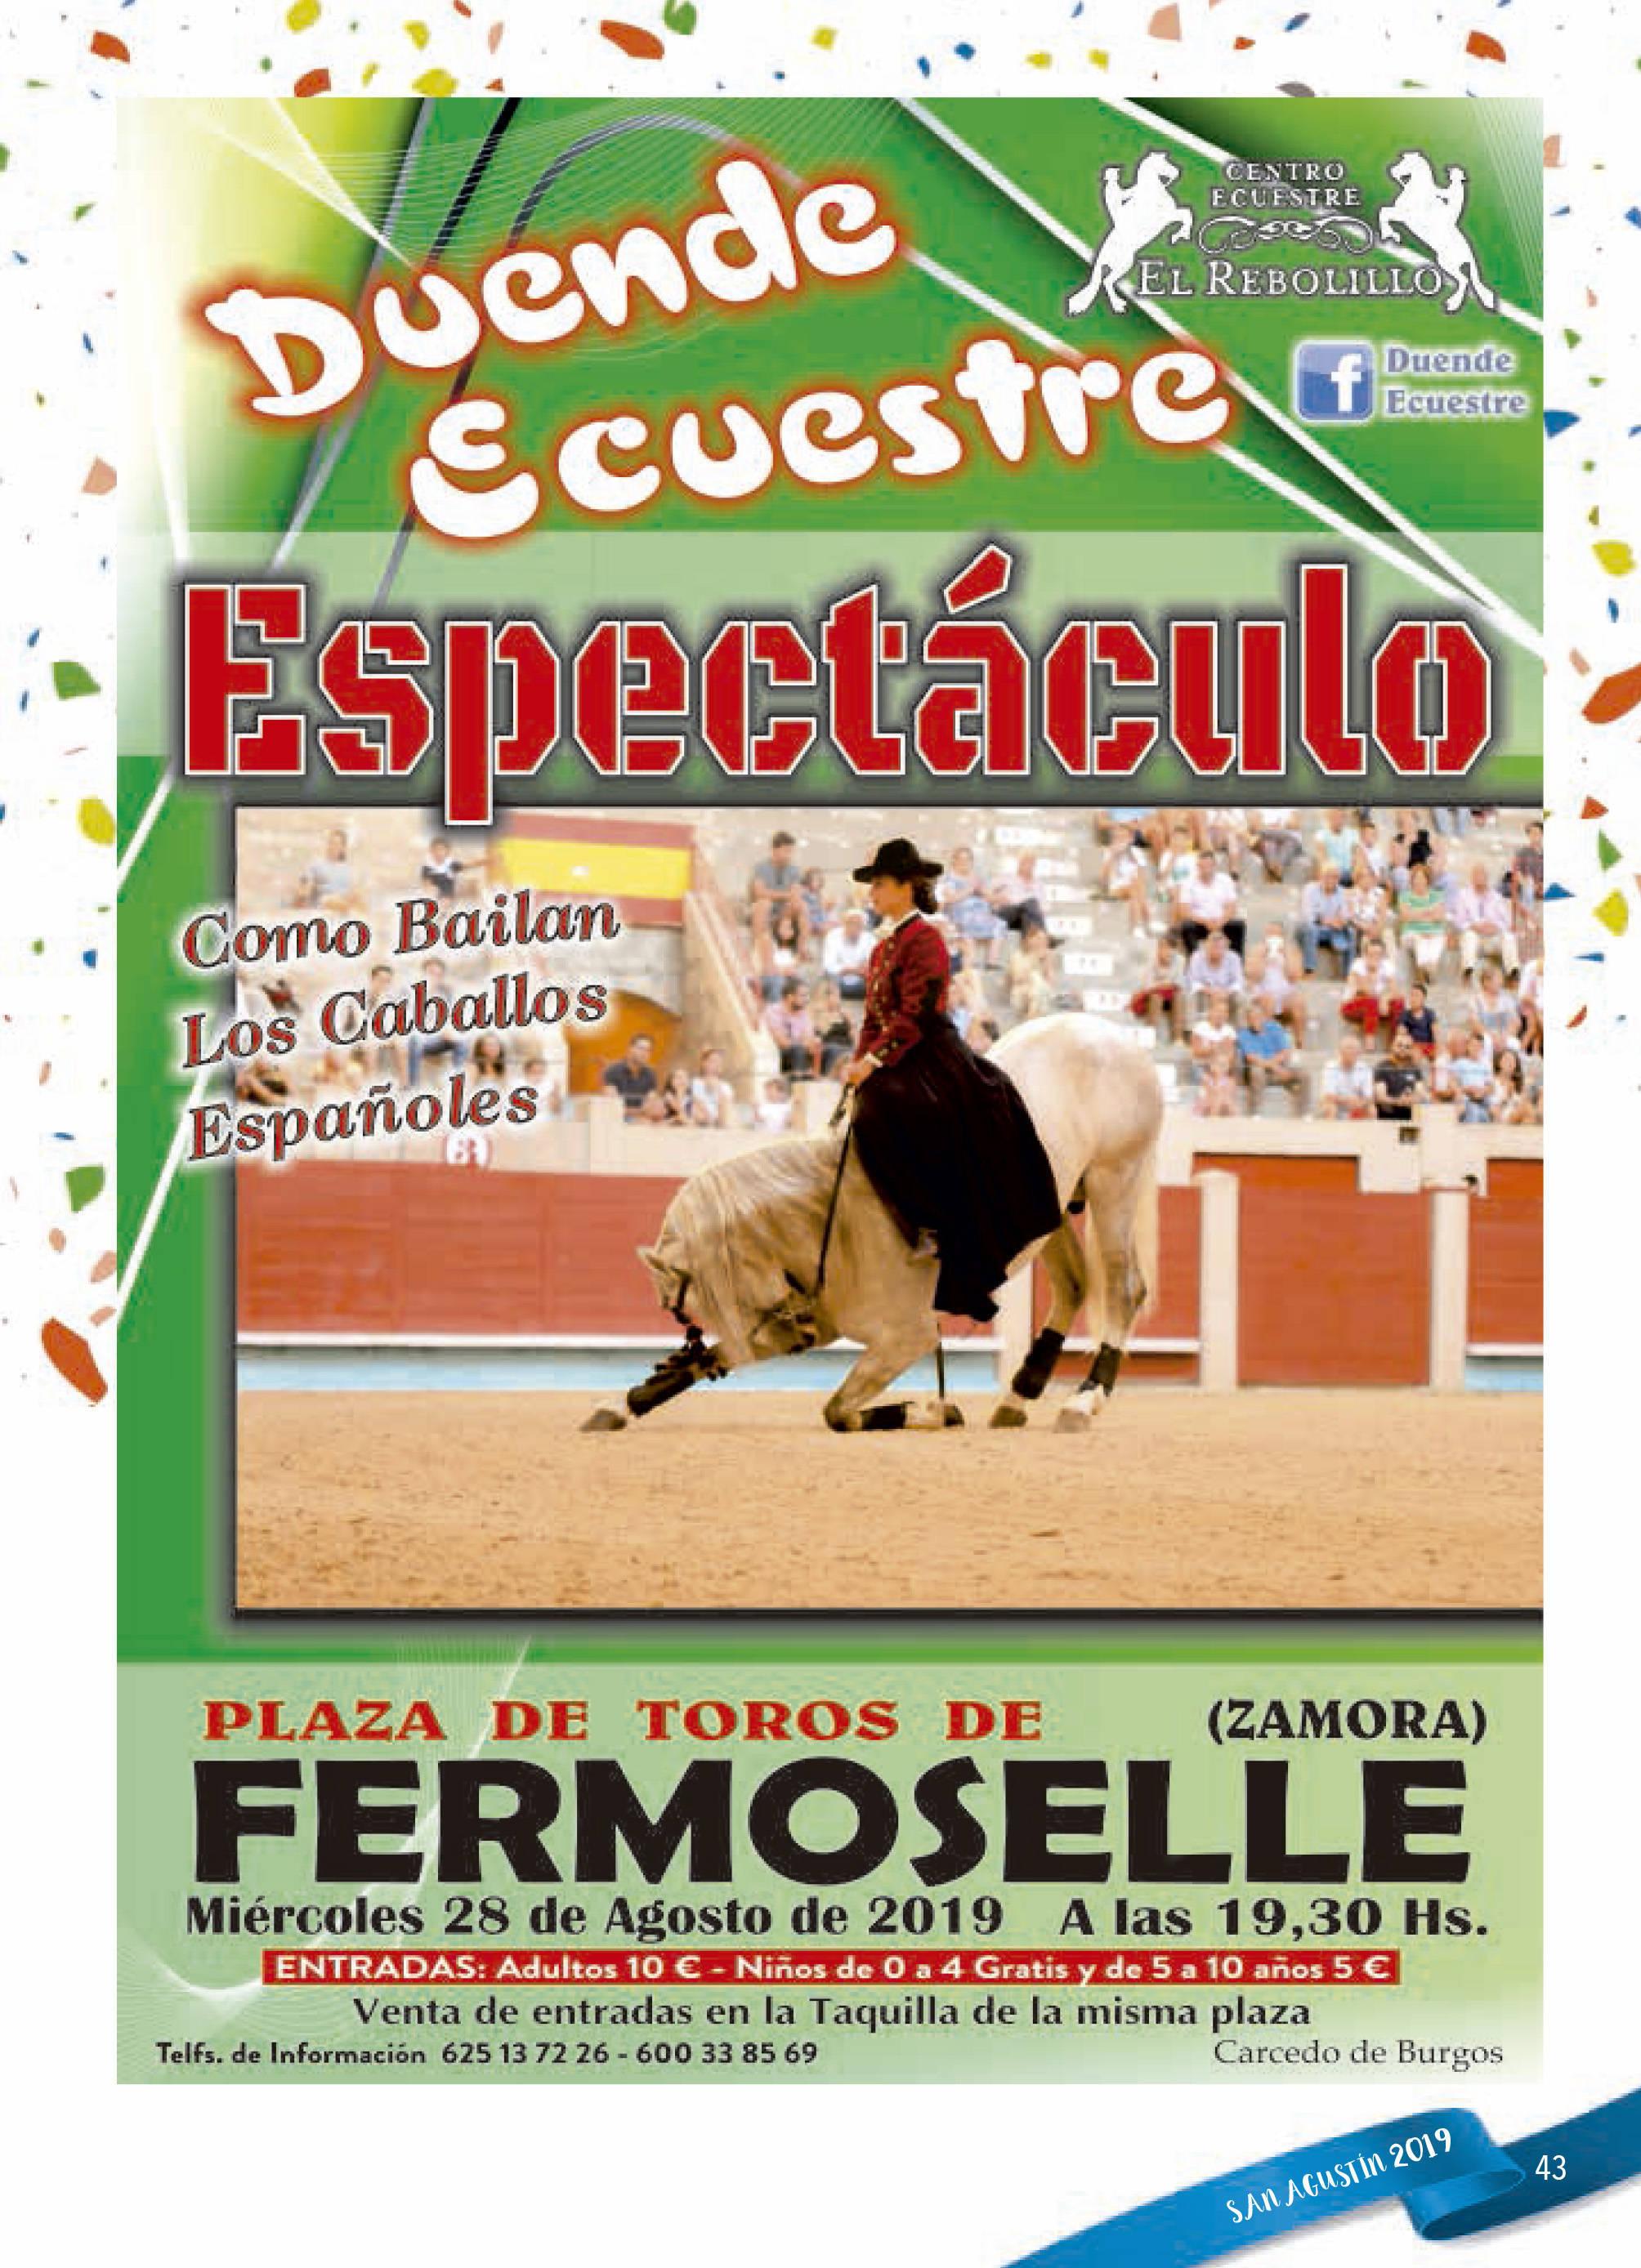 Programa de ferias y fiestas 2019 - Fermoselle (Zamora) 16